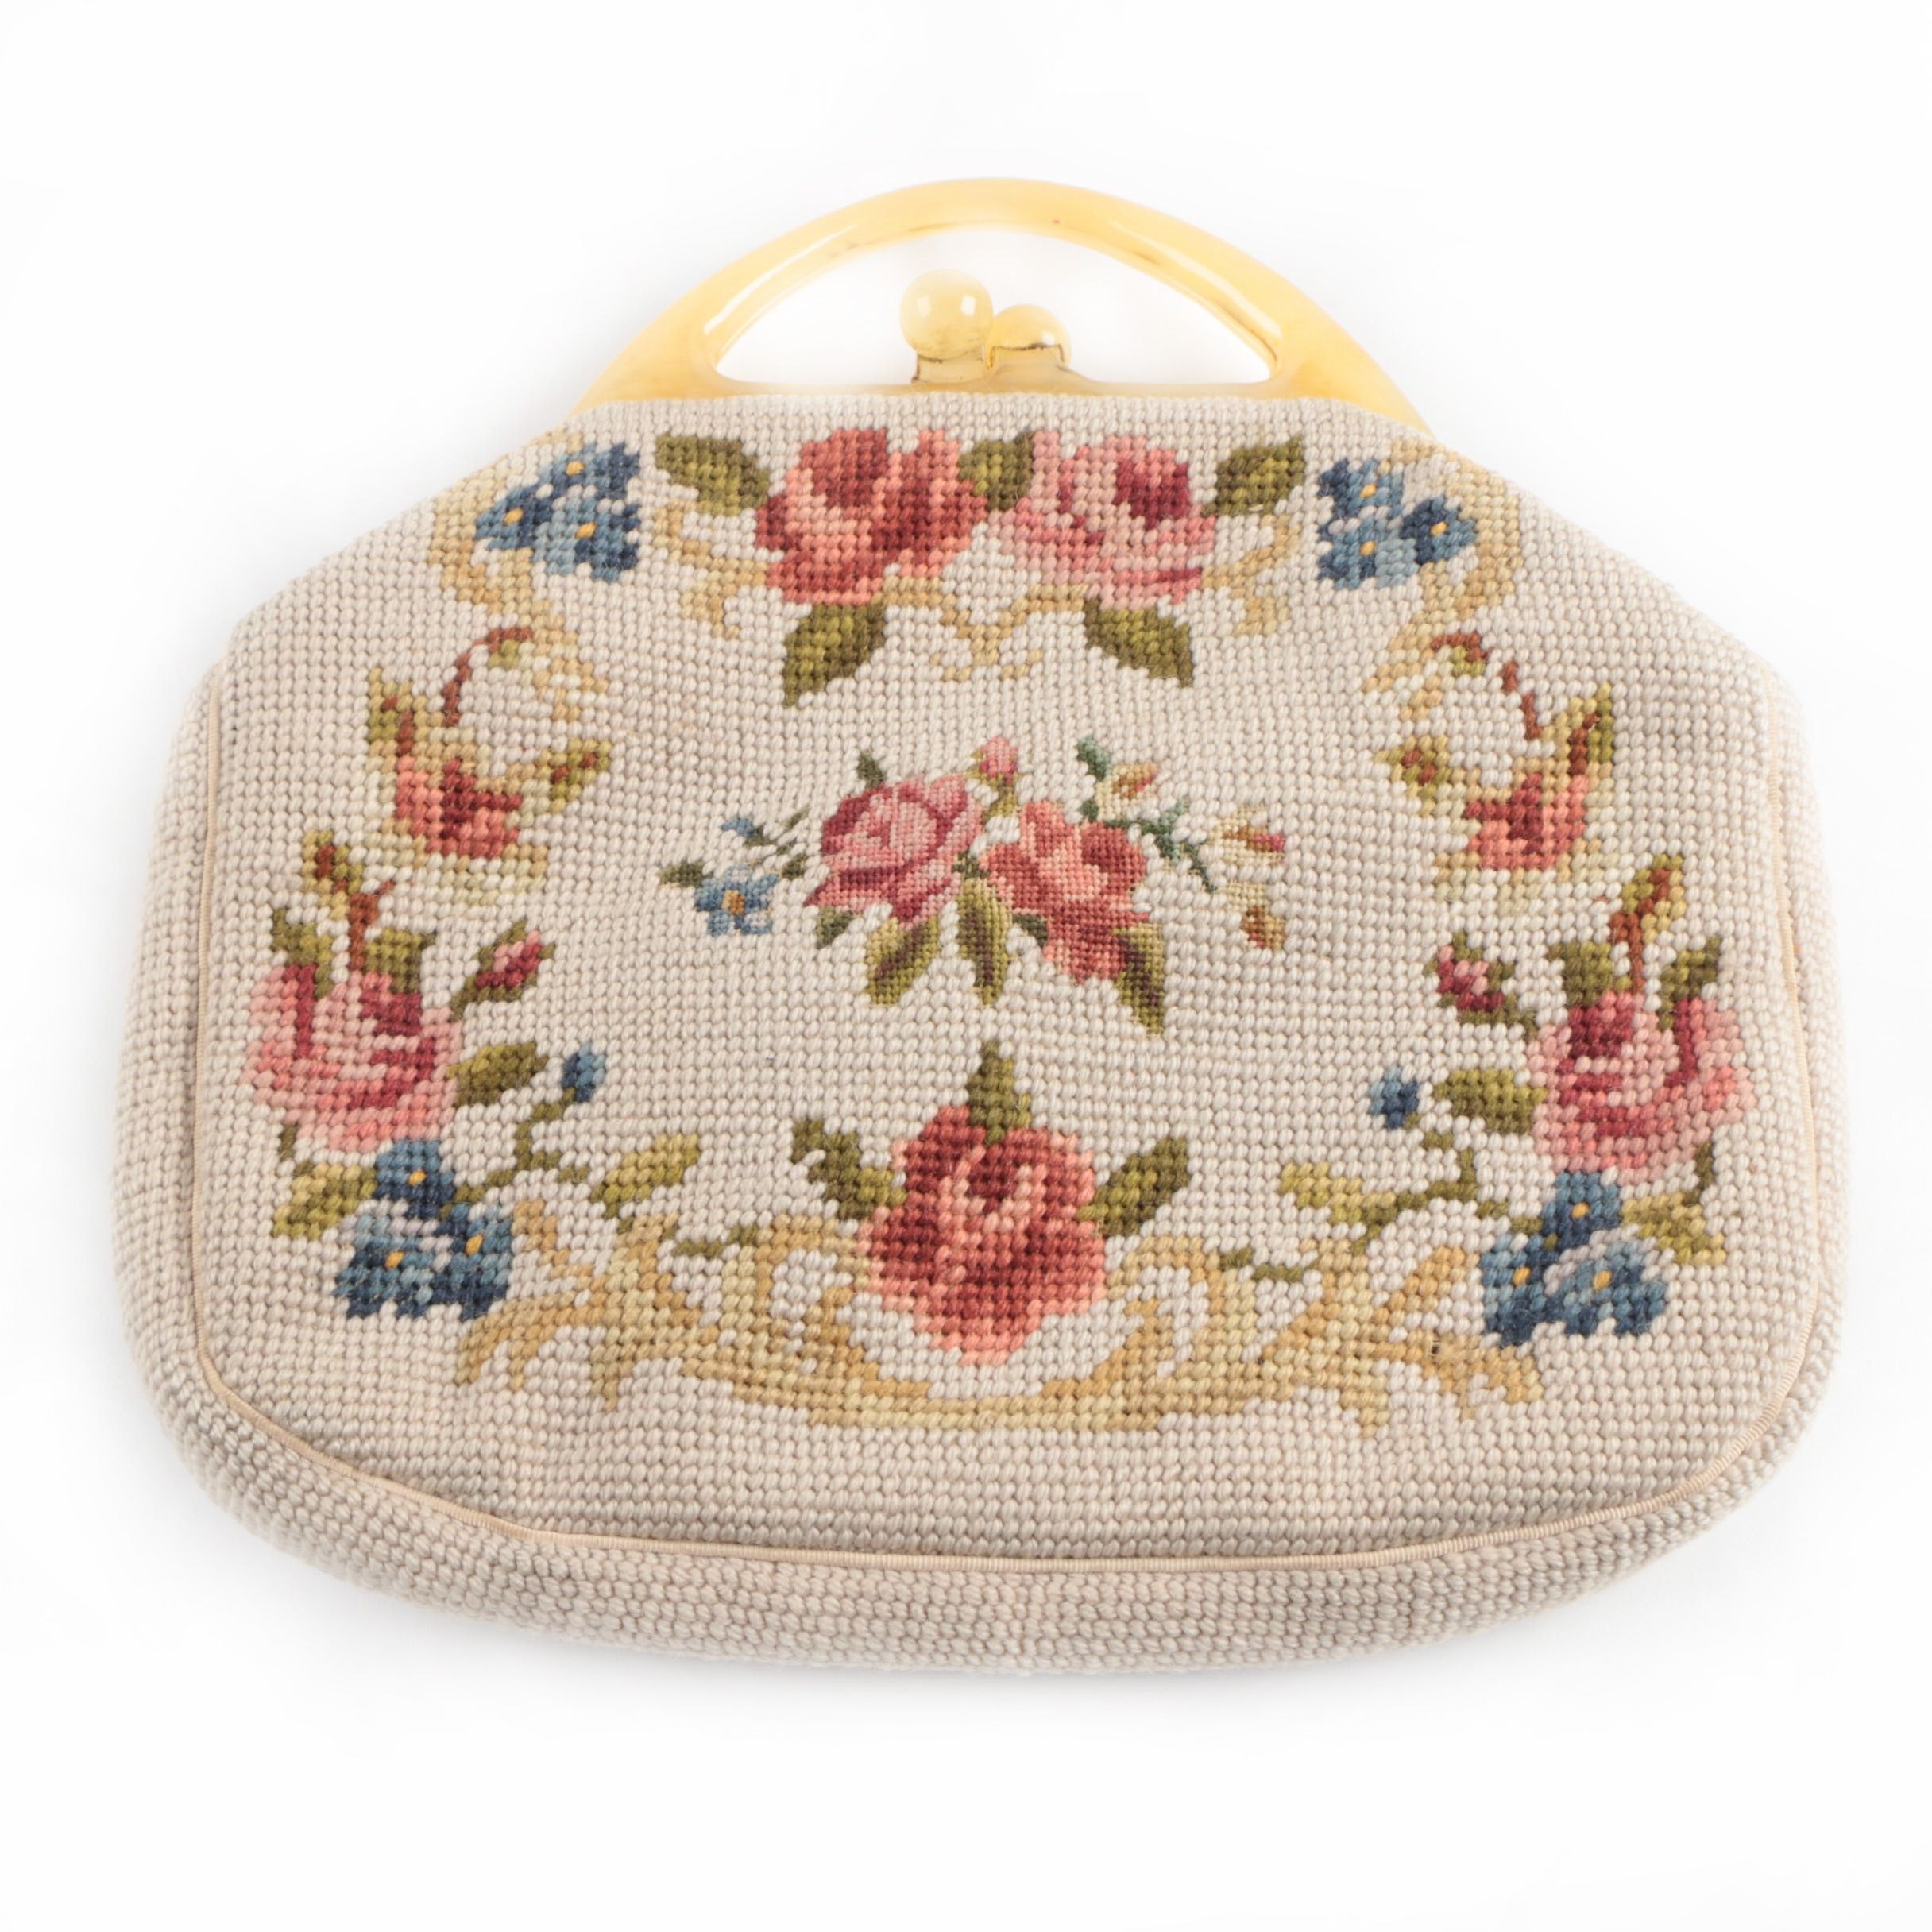 Vintage Maud Hundley Needlepoint Handbag